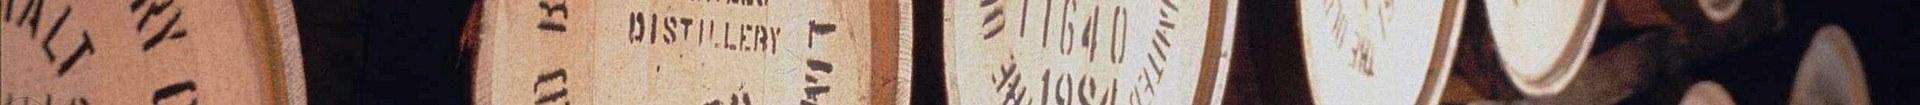 7022121-barrels-whisky